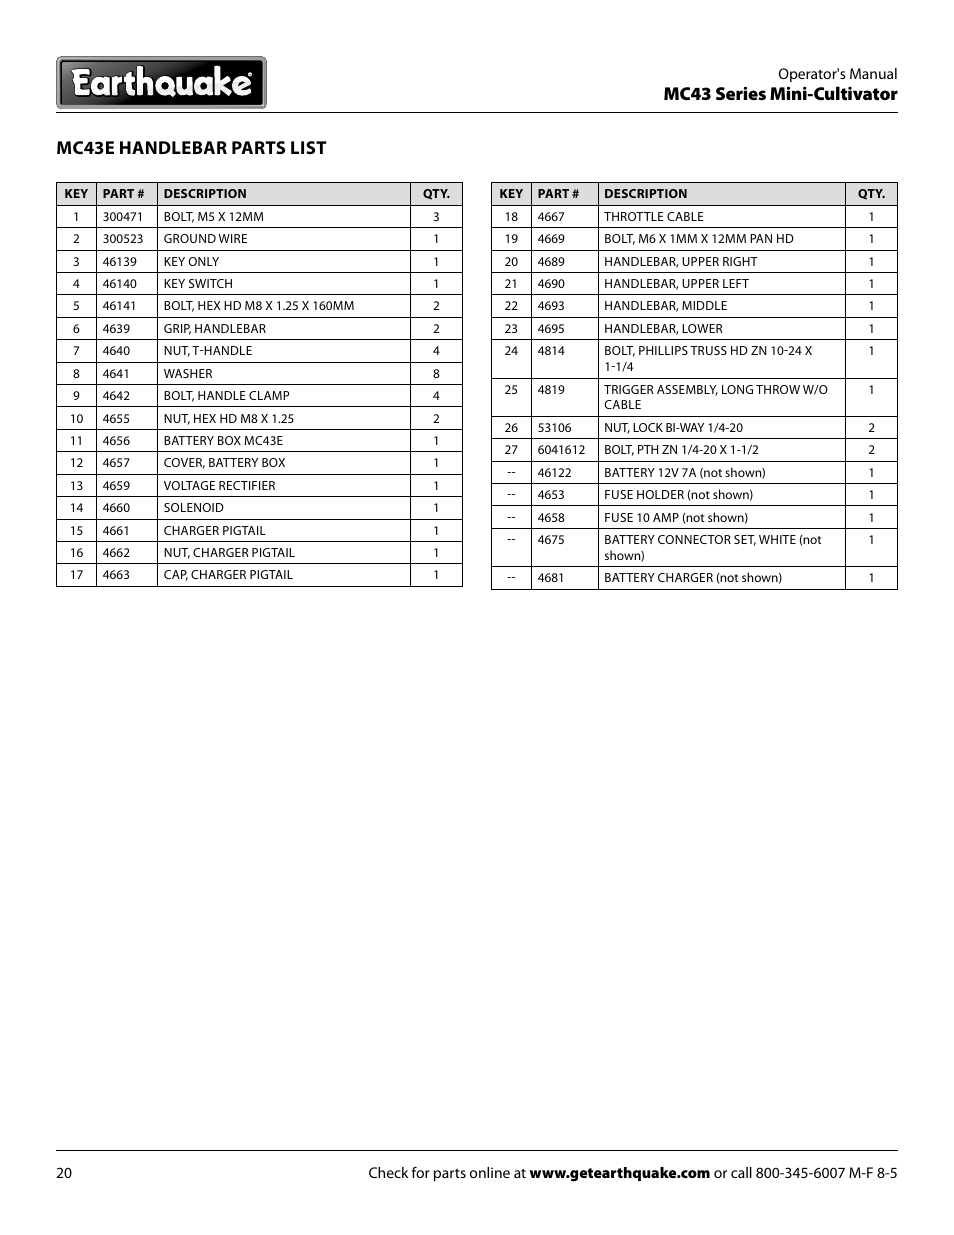 Mc43 series mini-cultivator, Mc43e handlebar parts list